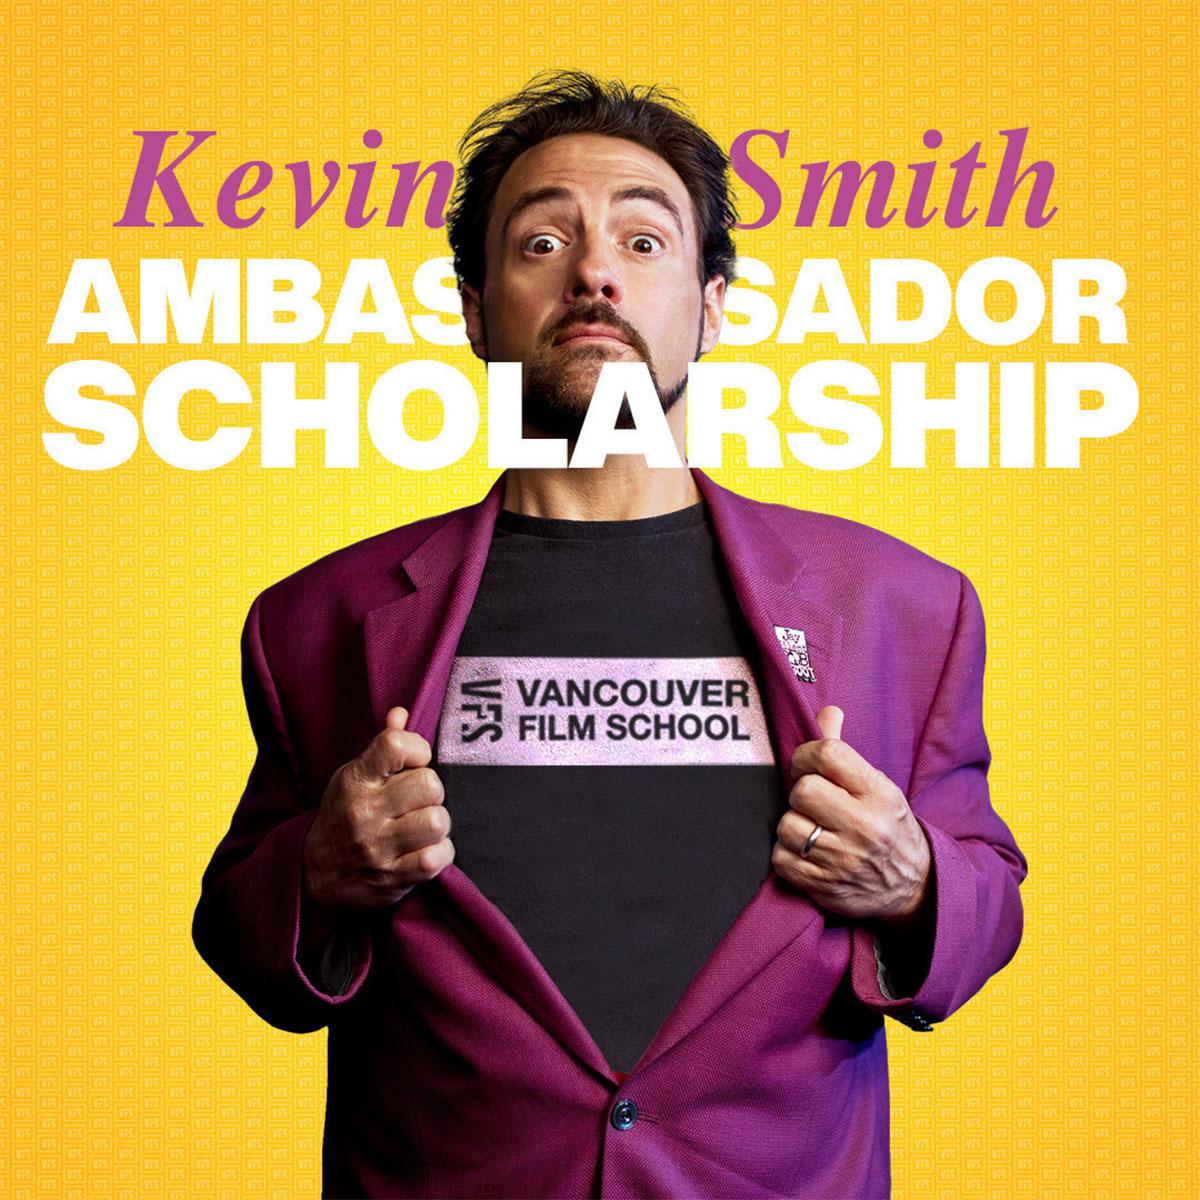 Vancouver Film School Announces the 2021 Kevin Smith Ambassador Scholarship